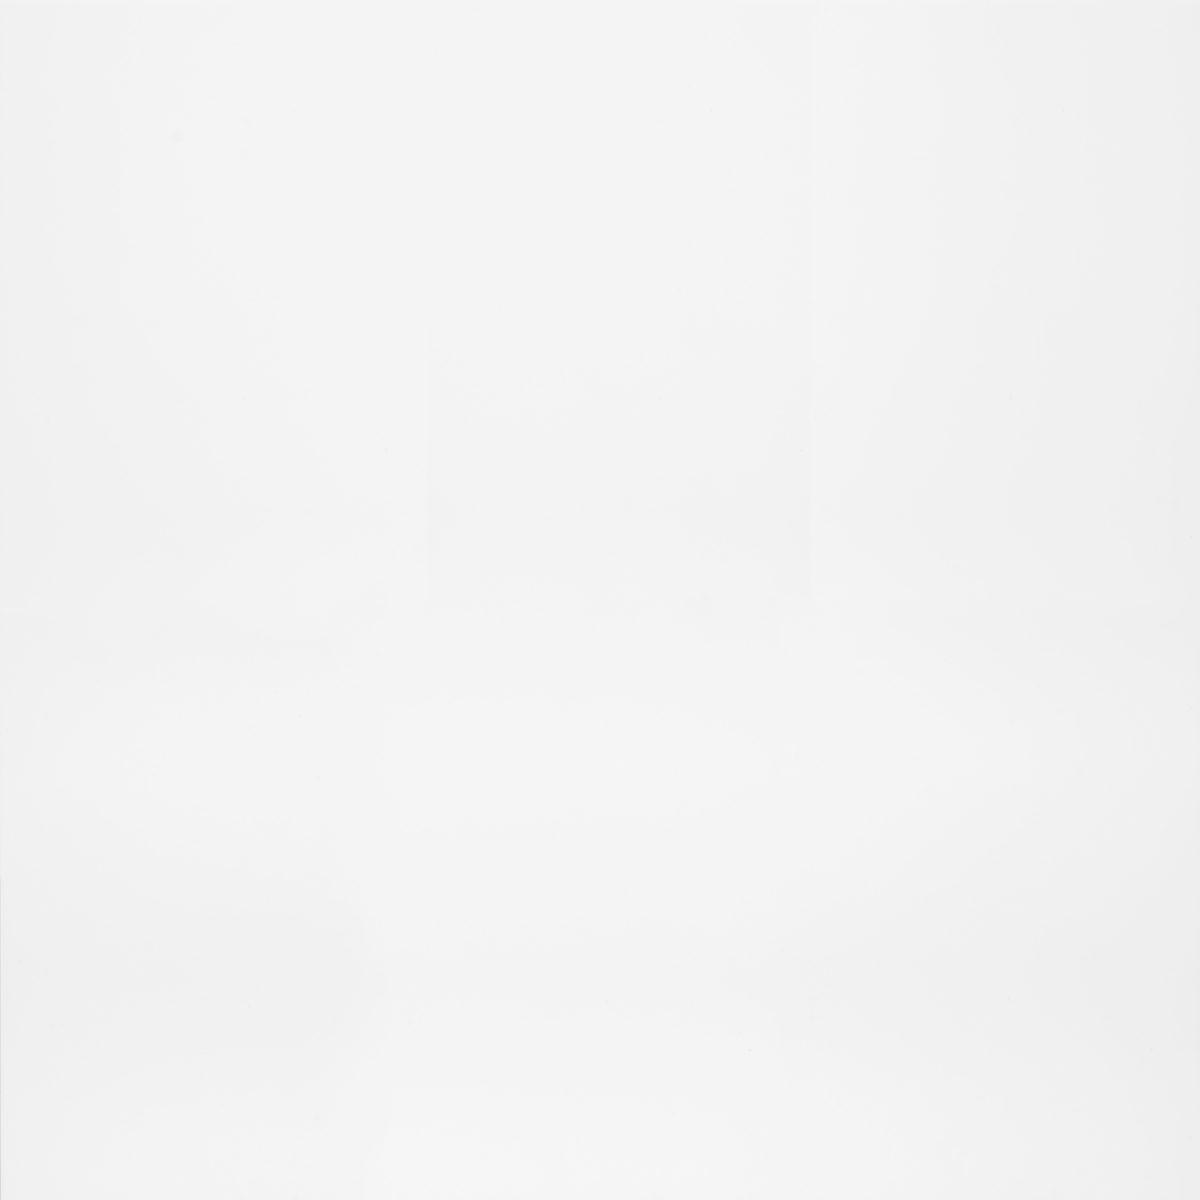 Lapitech Worktop Absolute White - Satin Finish